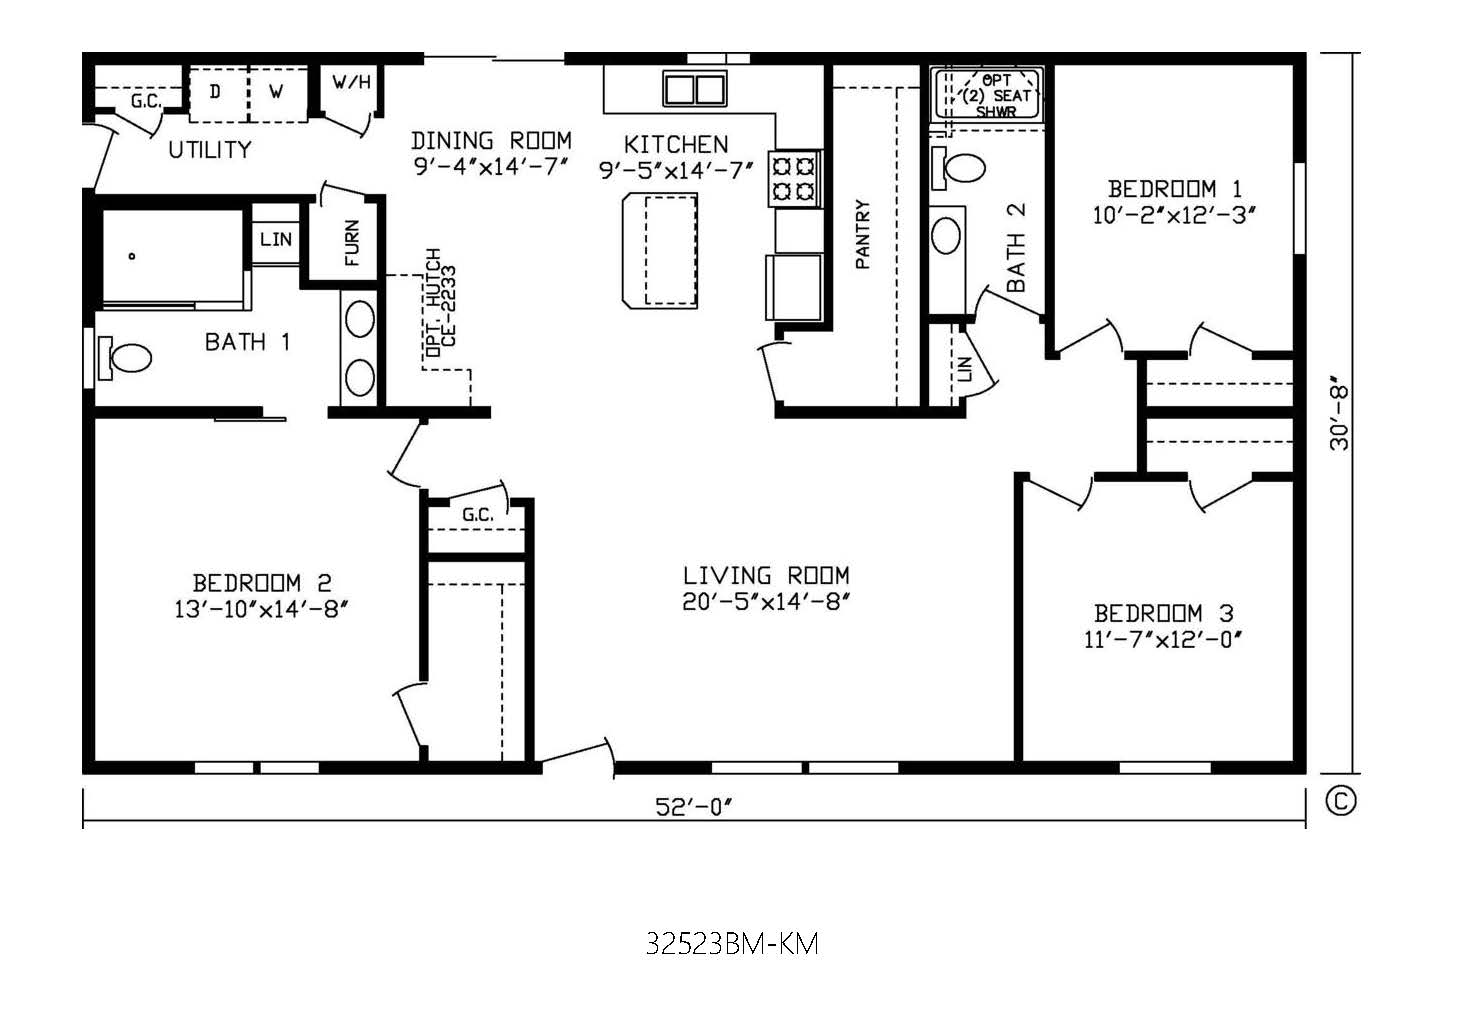 Modular Home Floorplans – Huron Modular Homes